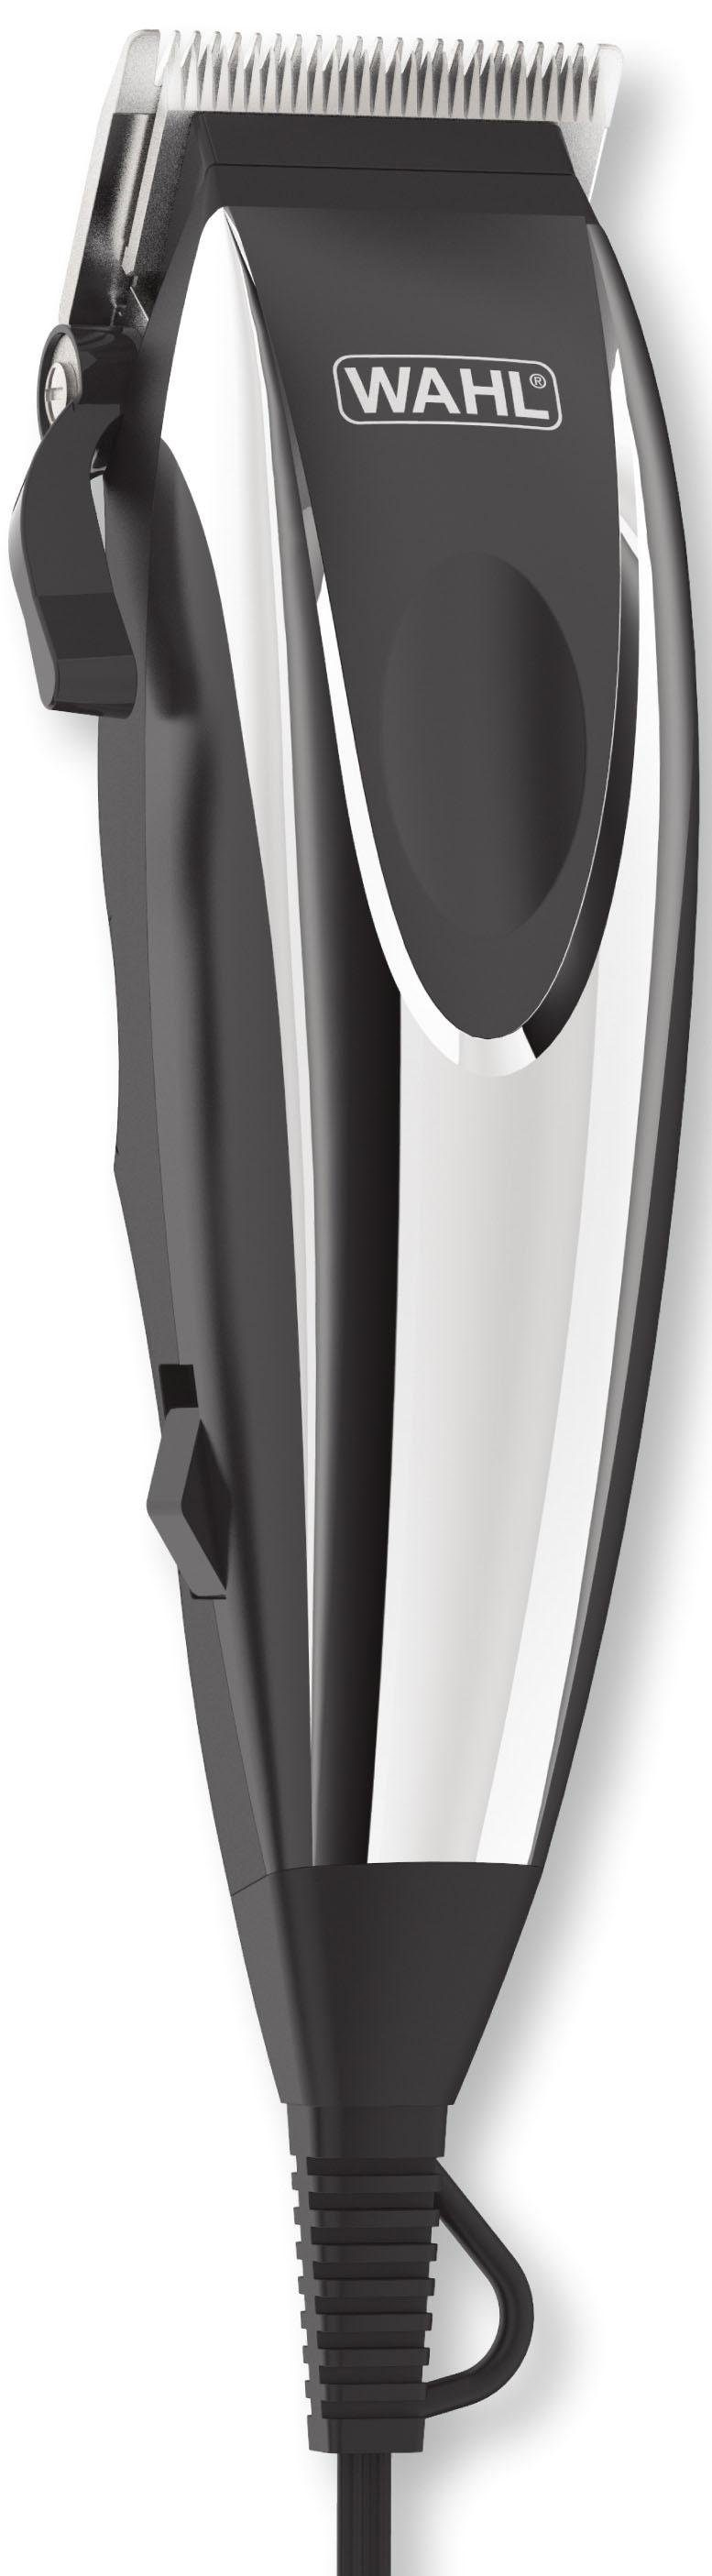 Wahl Netzbetriebener Haarschneider 09243-2616 Wahl Home Pro, Komplette Friseur Kit